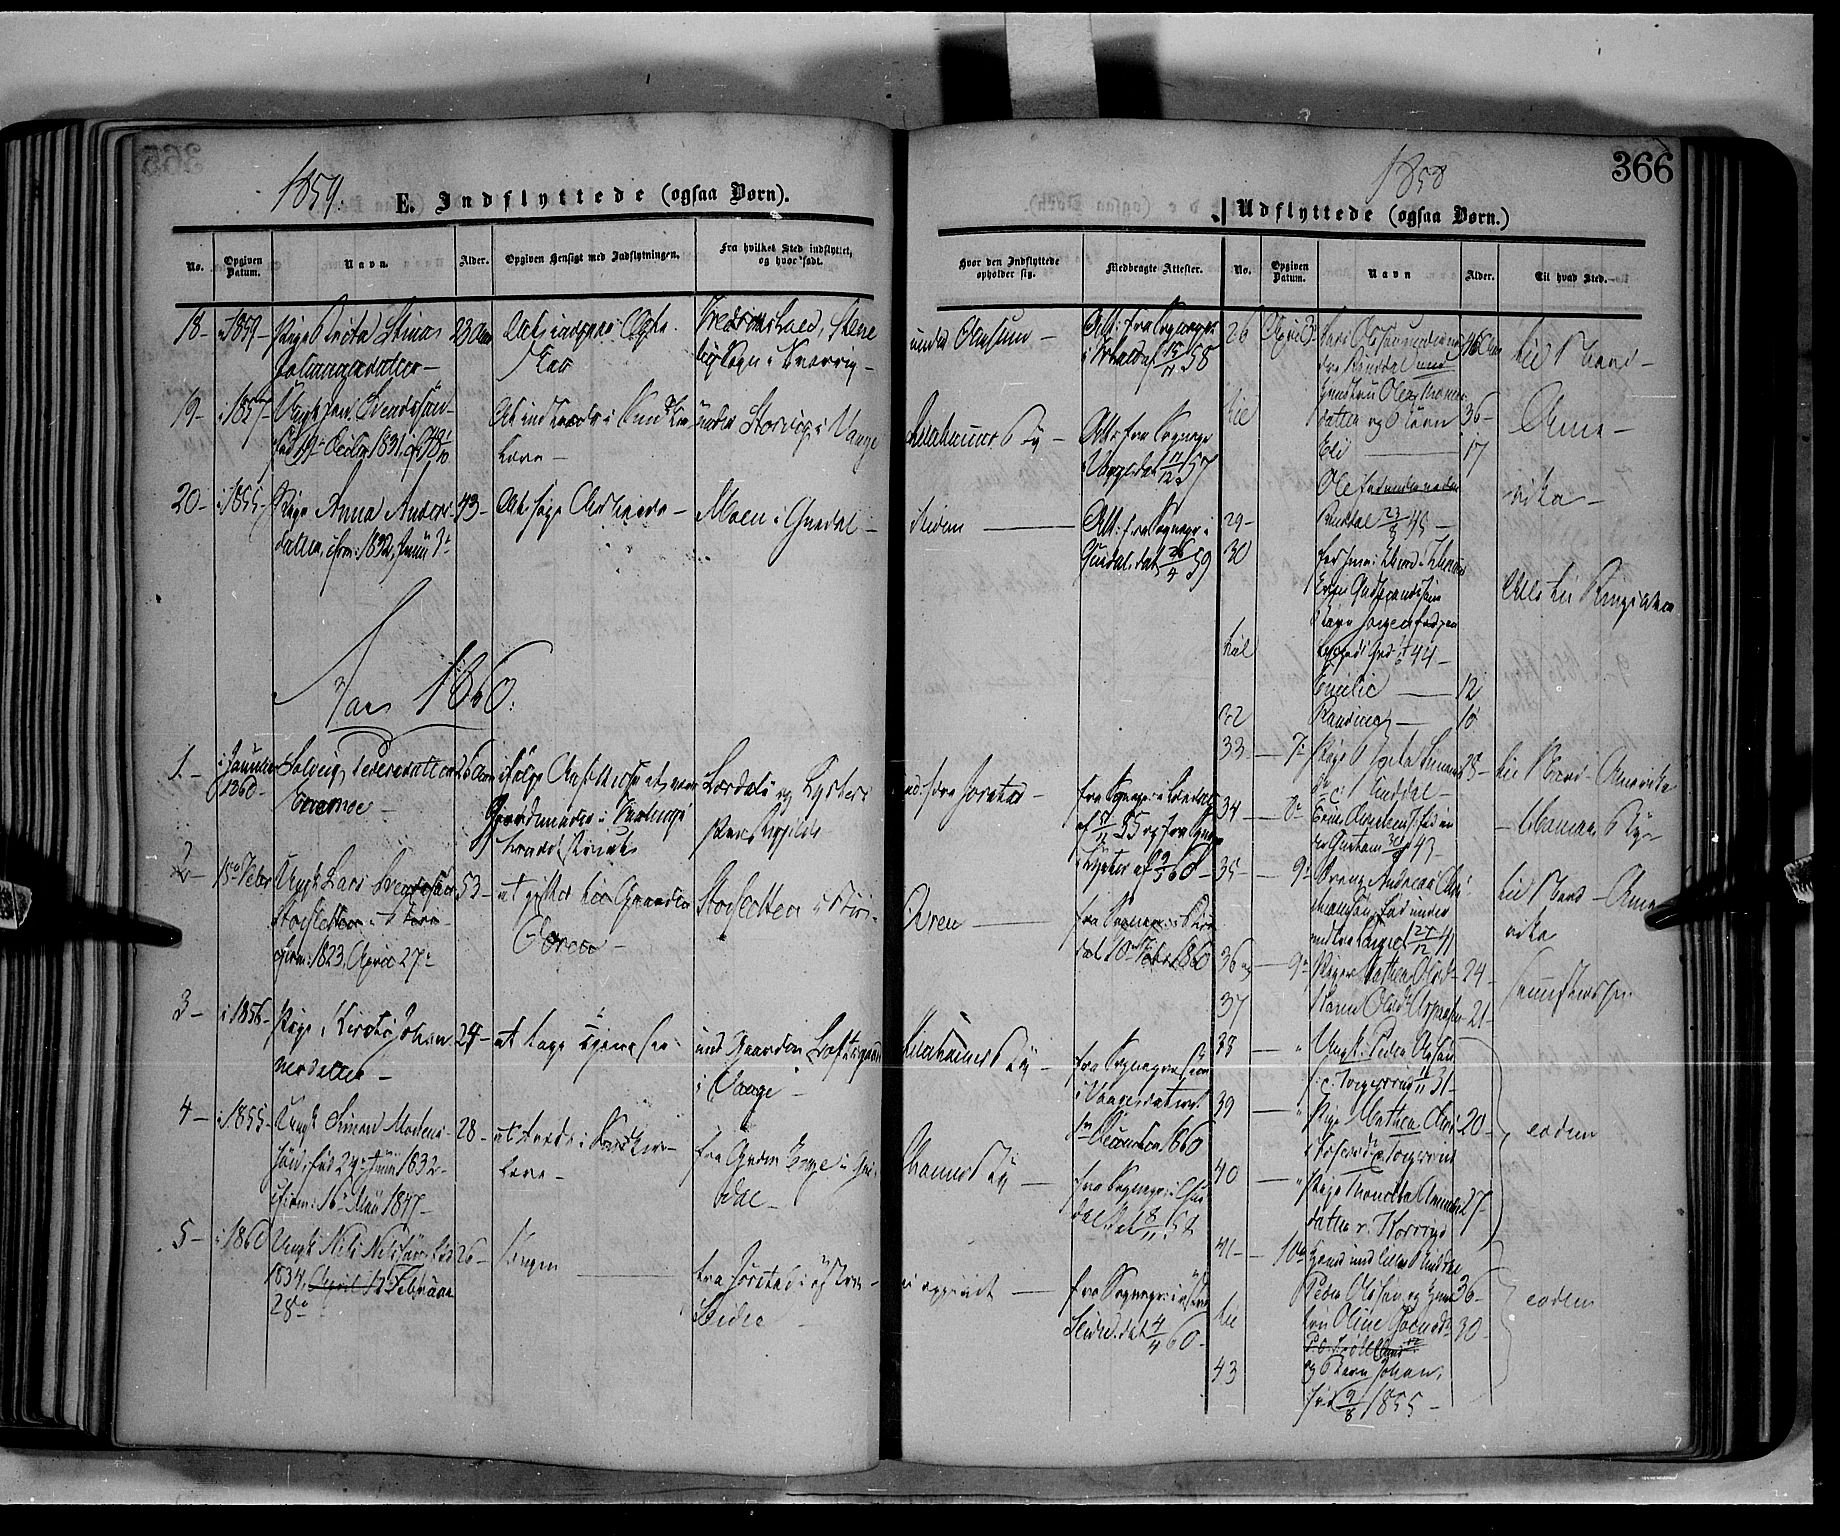 SAH, Fåberg prestekontor, Ministerialbok nr. 6B, 1855-1867, s. 366